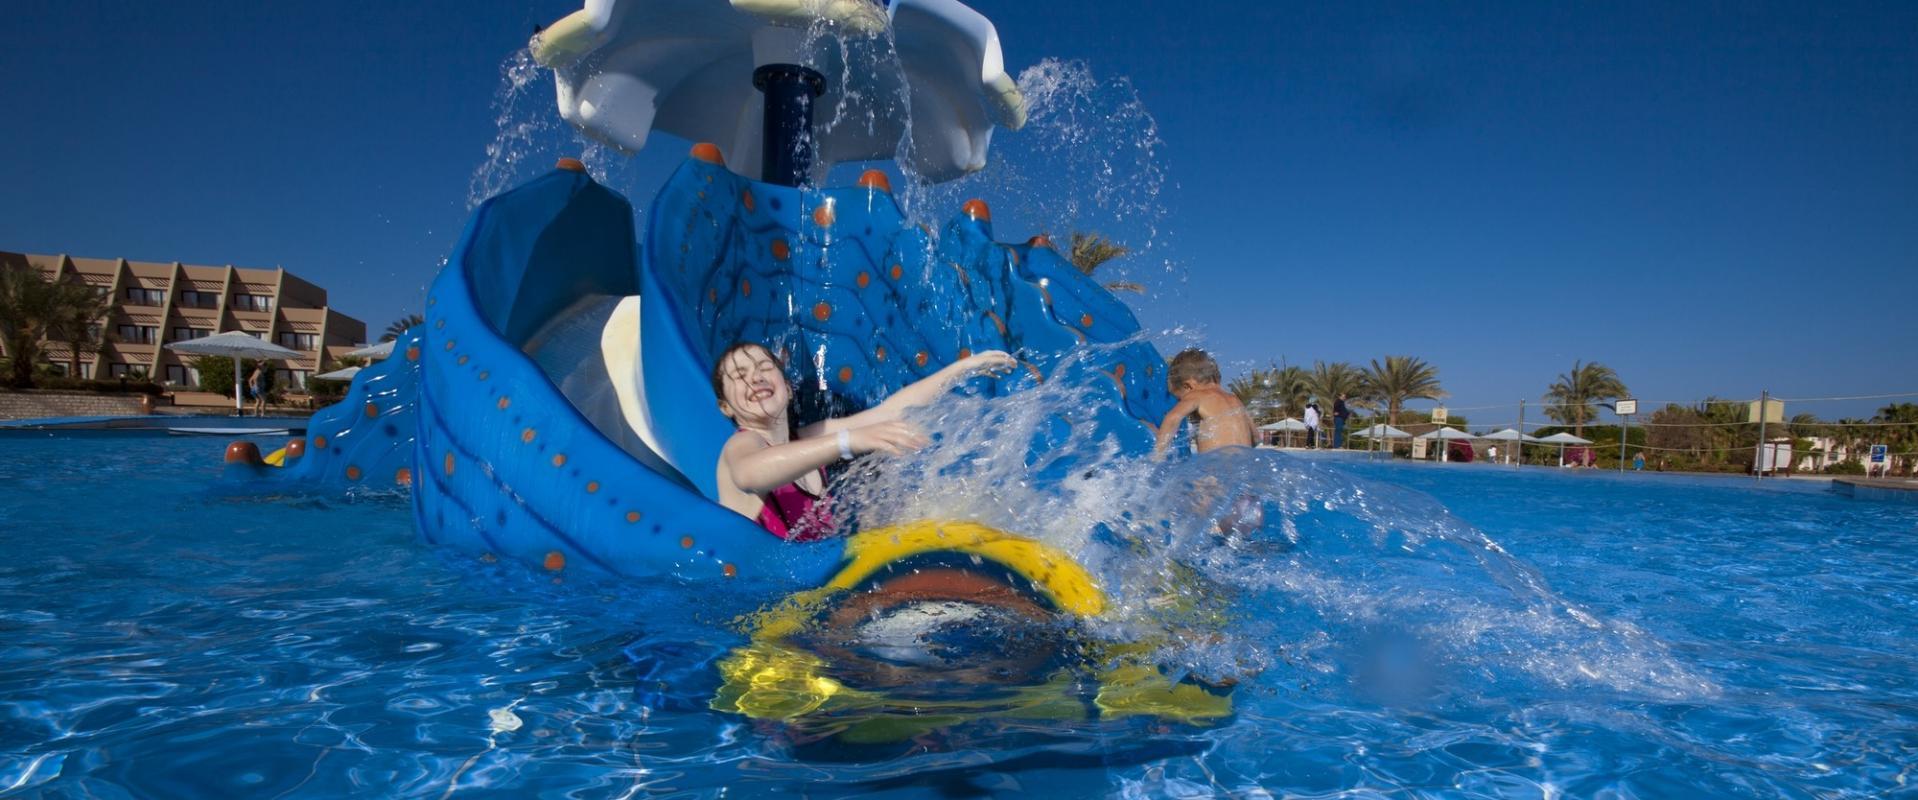 http://egypte.croisiere.voyage/wp-content/uploads/2016/11/HRG-SH-Hurghada-Mini-Aqua-Park-2.jpg